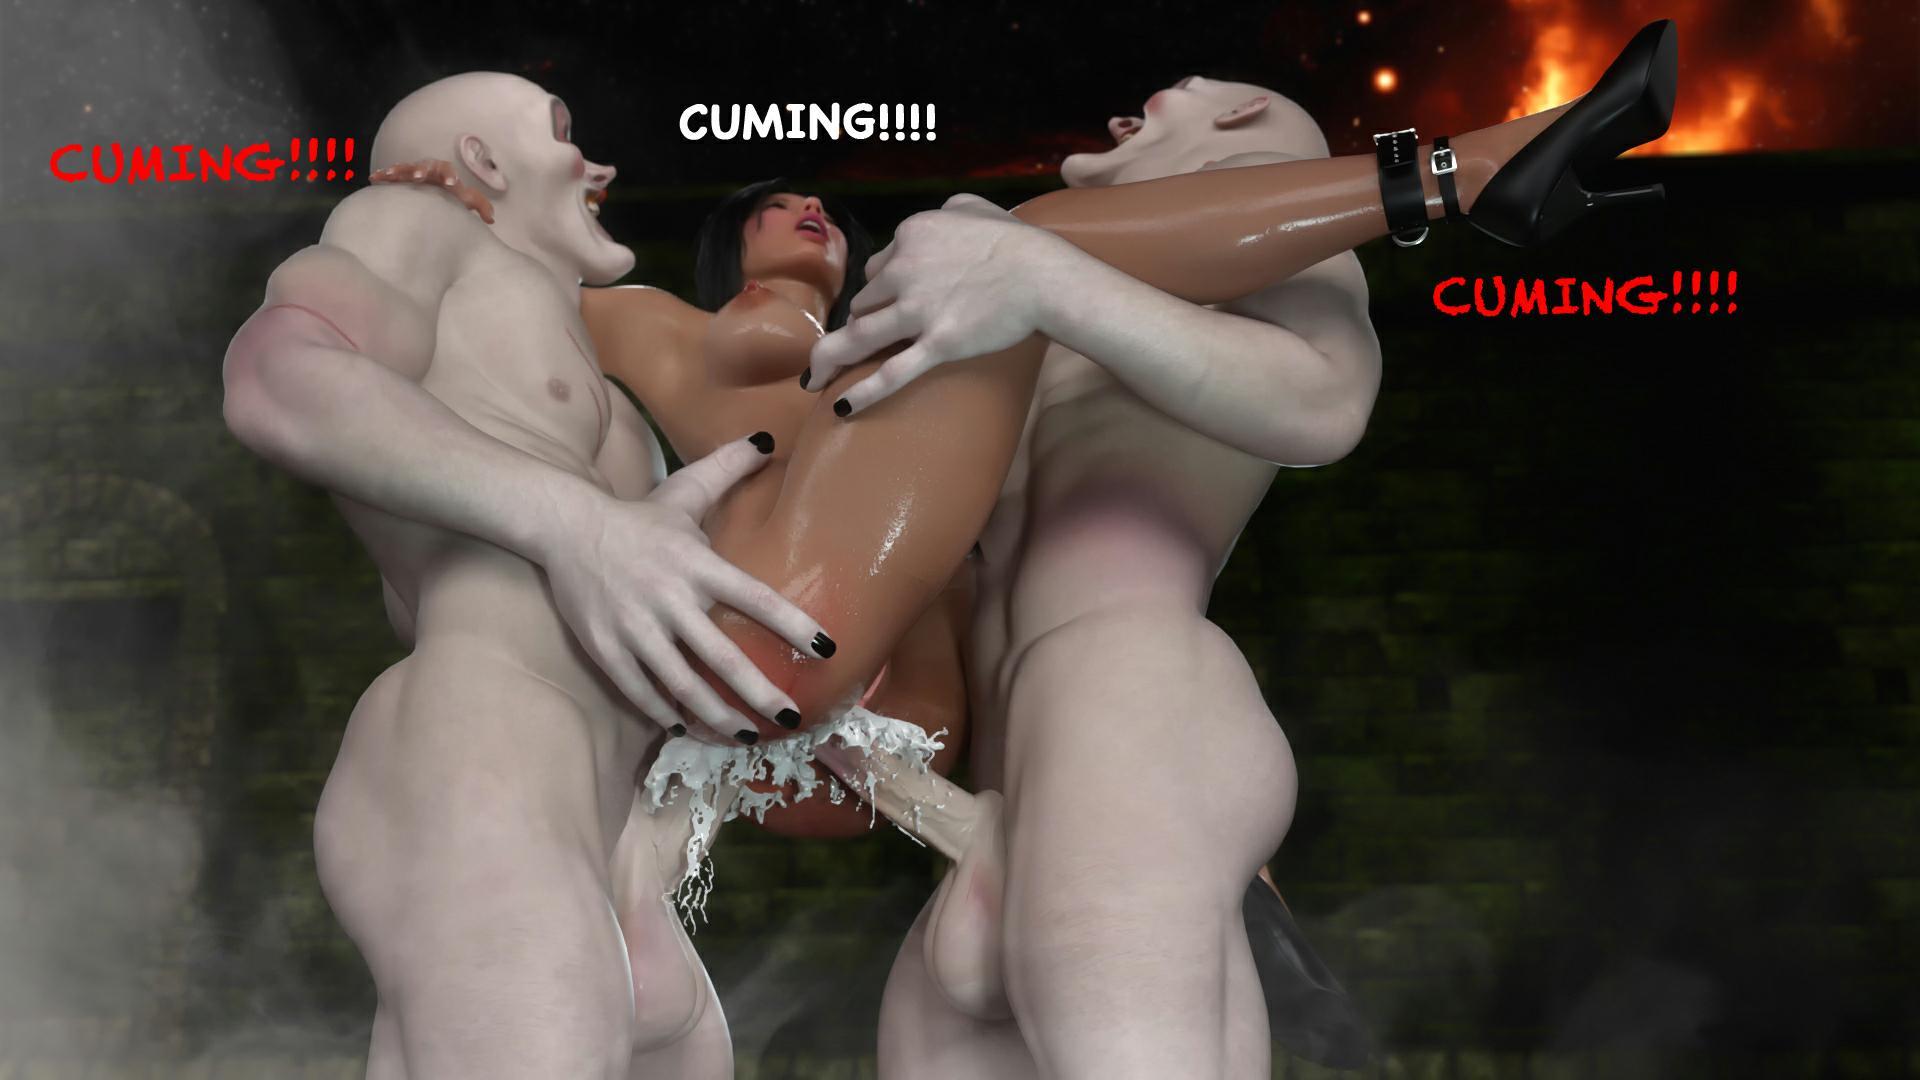 skachat-besplatno-video-seks-3g